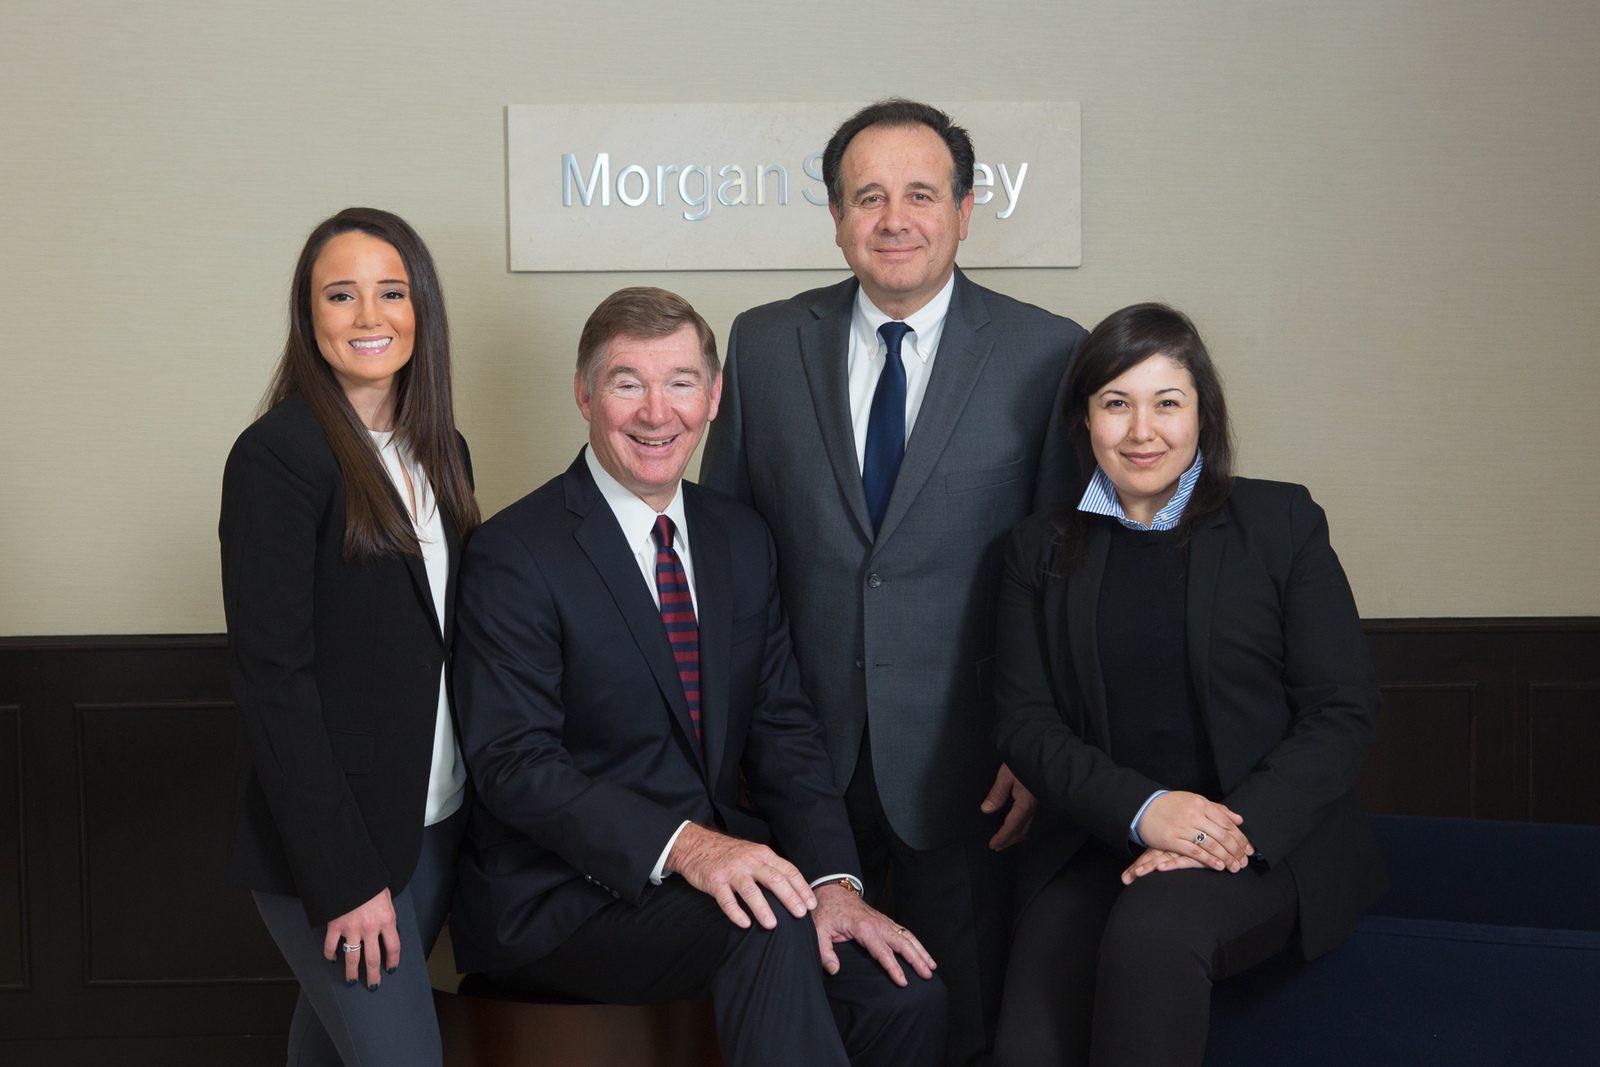 The Michienzi Gregory Group | Wellesley, MA | Morgan Stanley